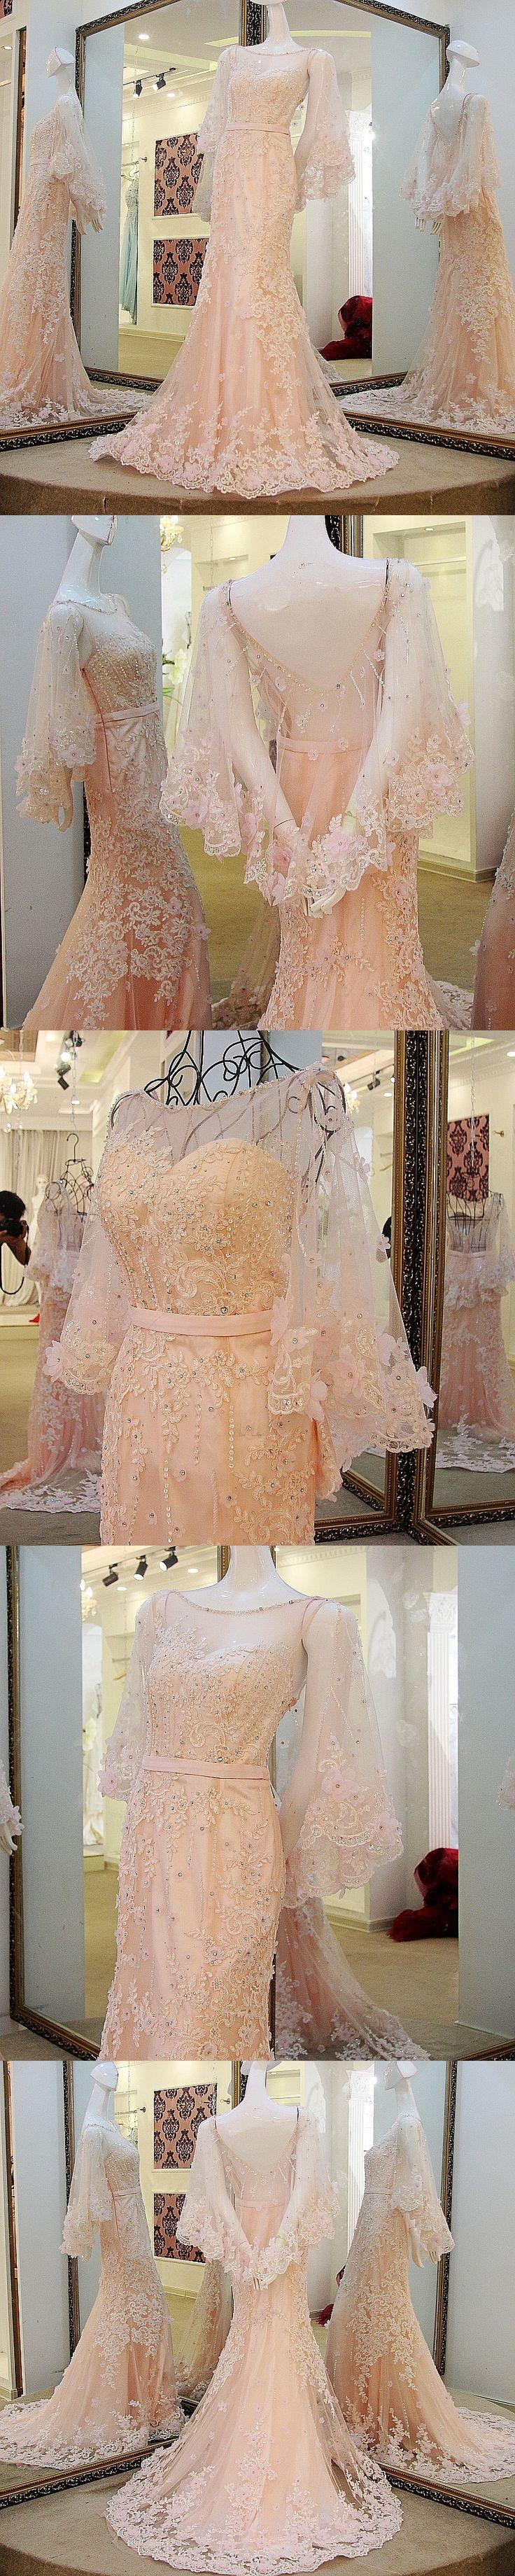 2017 Sexy Mermaid Evening Dress vestido longo de festa Special Occasion Dresses Long African Gown AB42